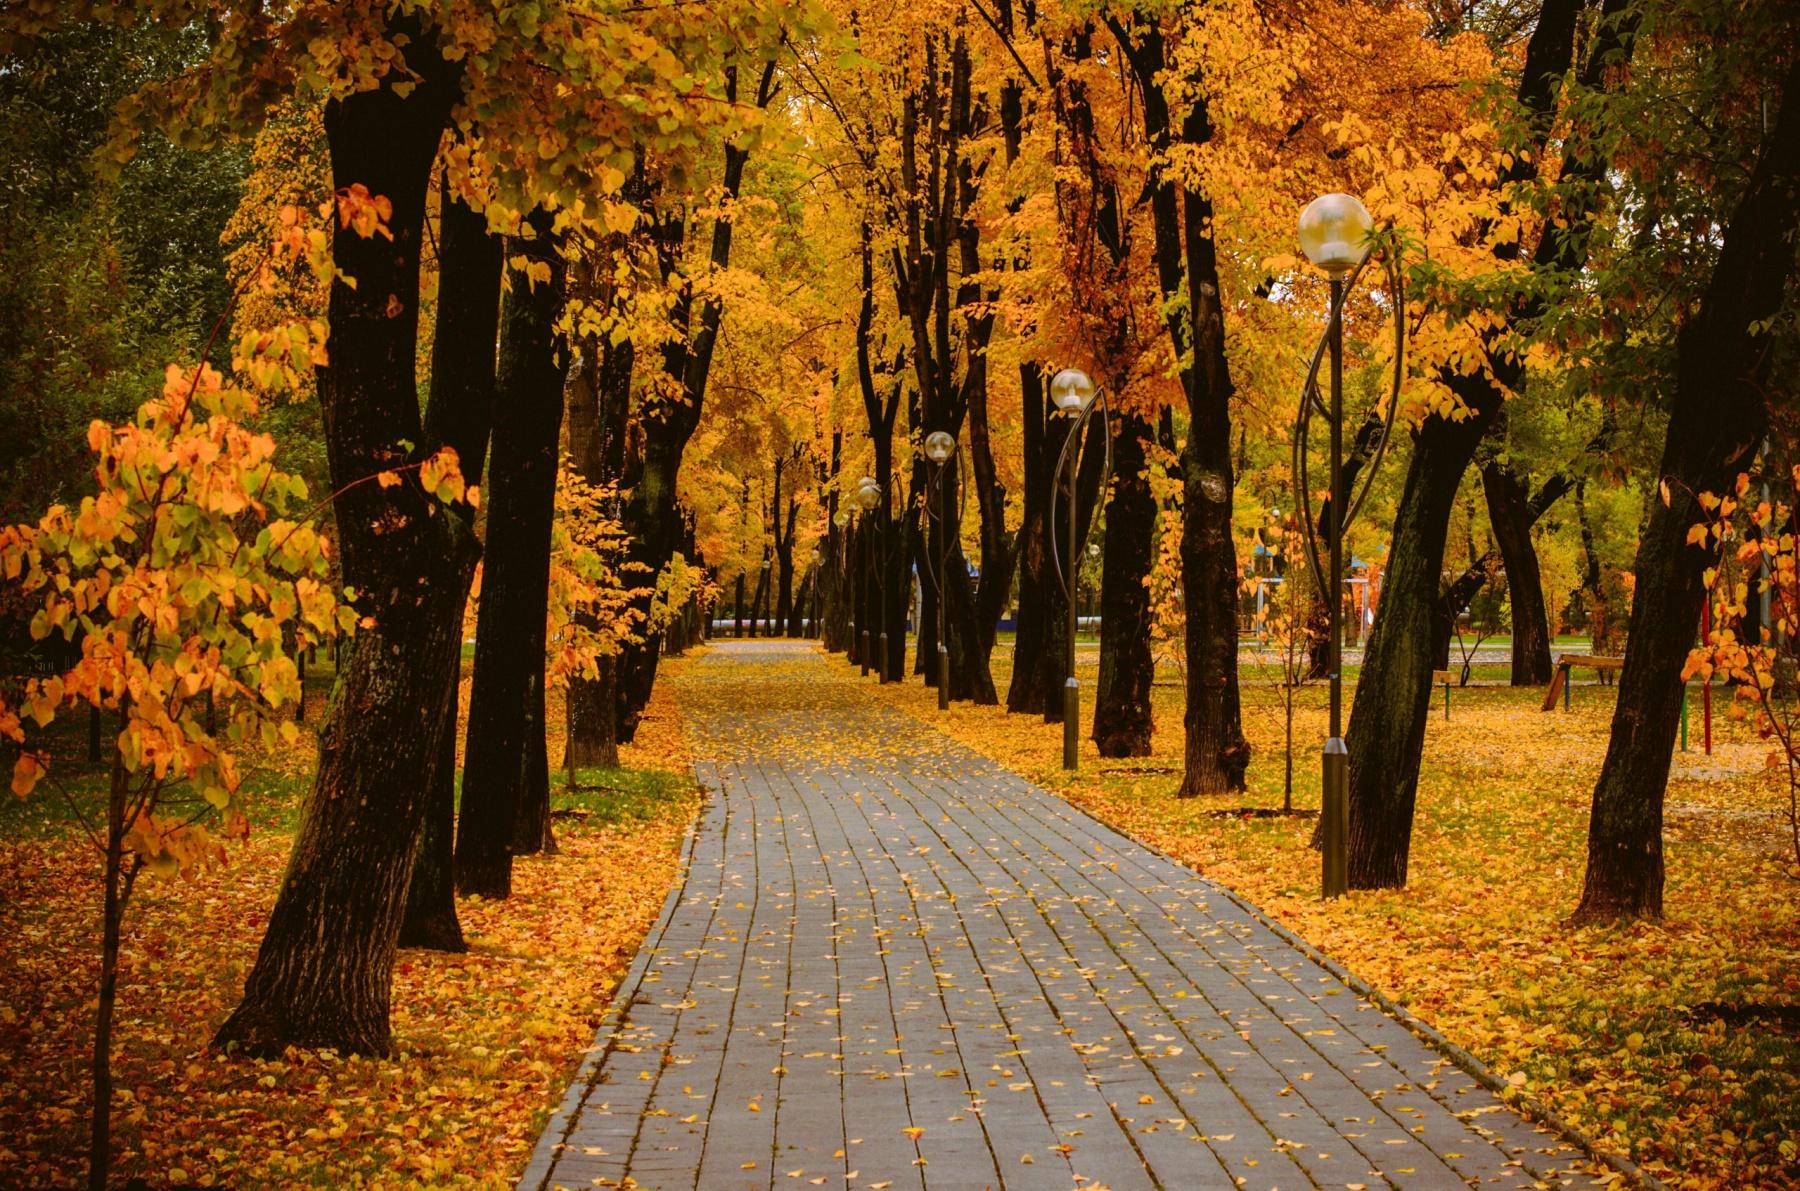 В объективе осень. Лучшее фото на осеннюю тему ищут в Тюмени